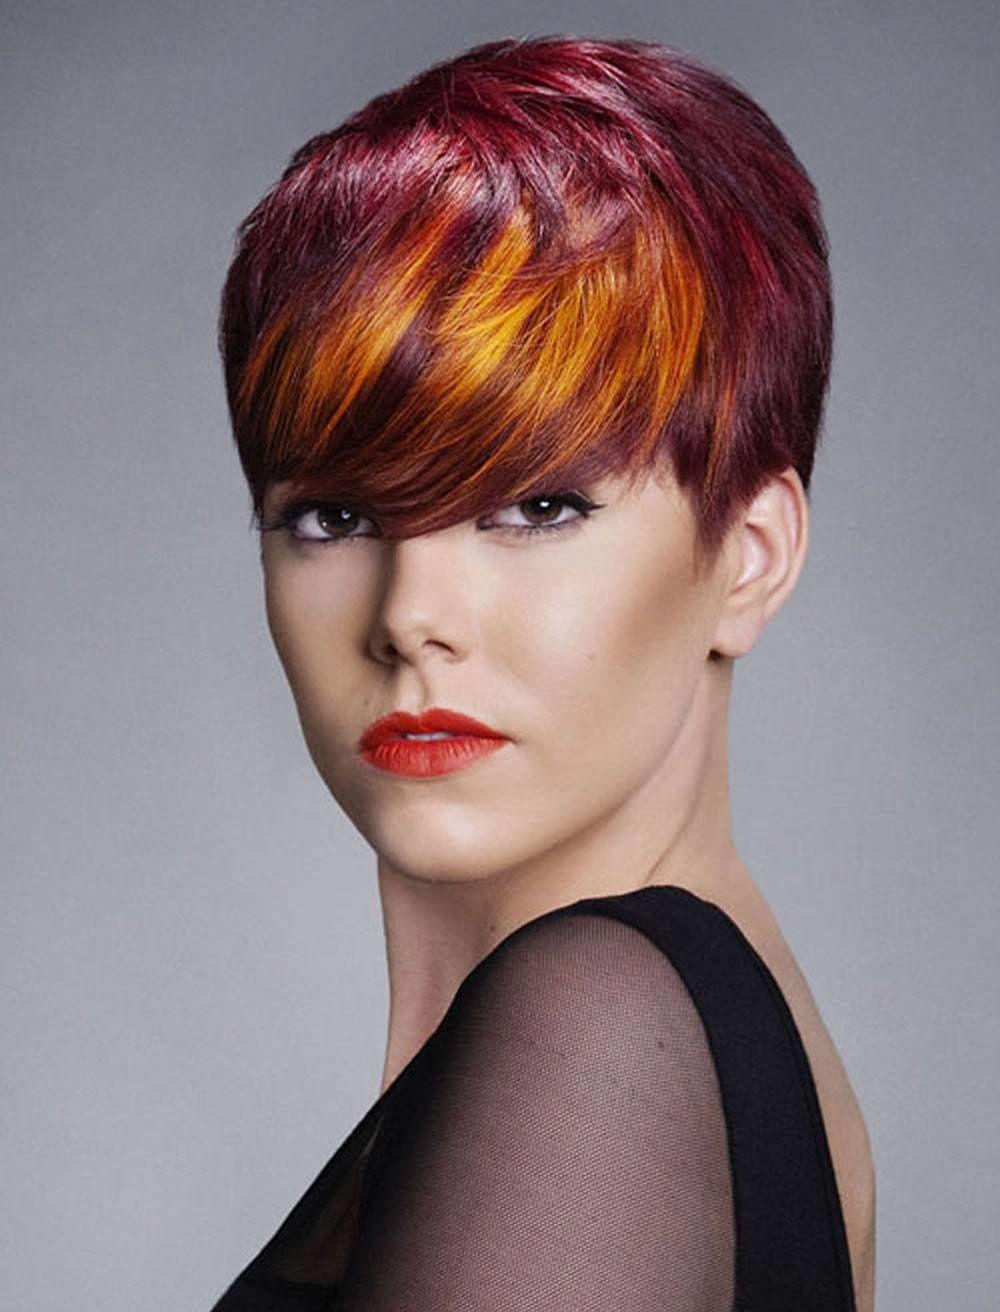 Картинки модного окрашивания коротких волос